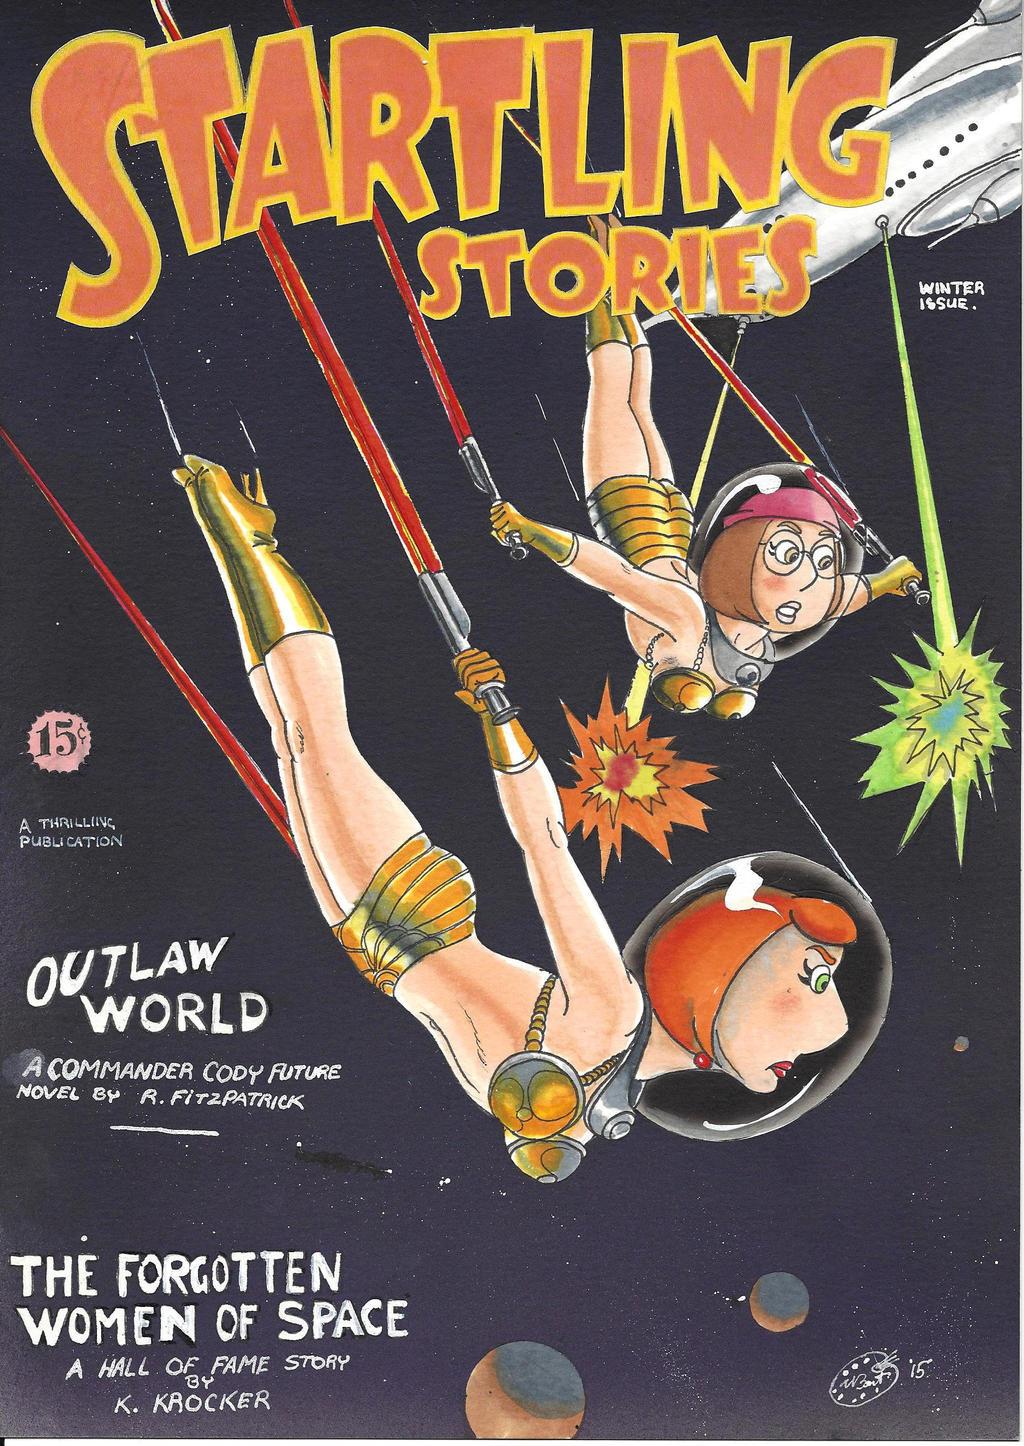 Startling Stories Magazine Cover By Kiff57krocker